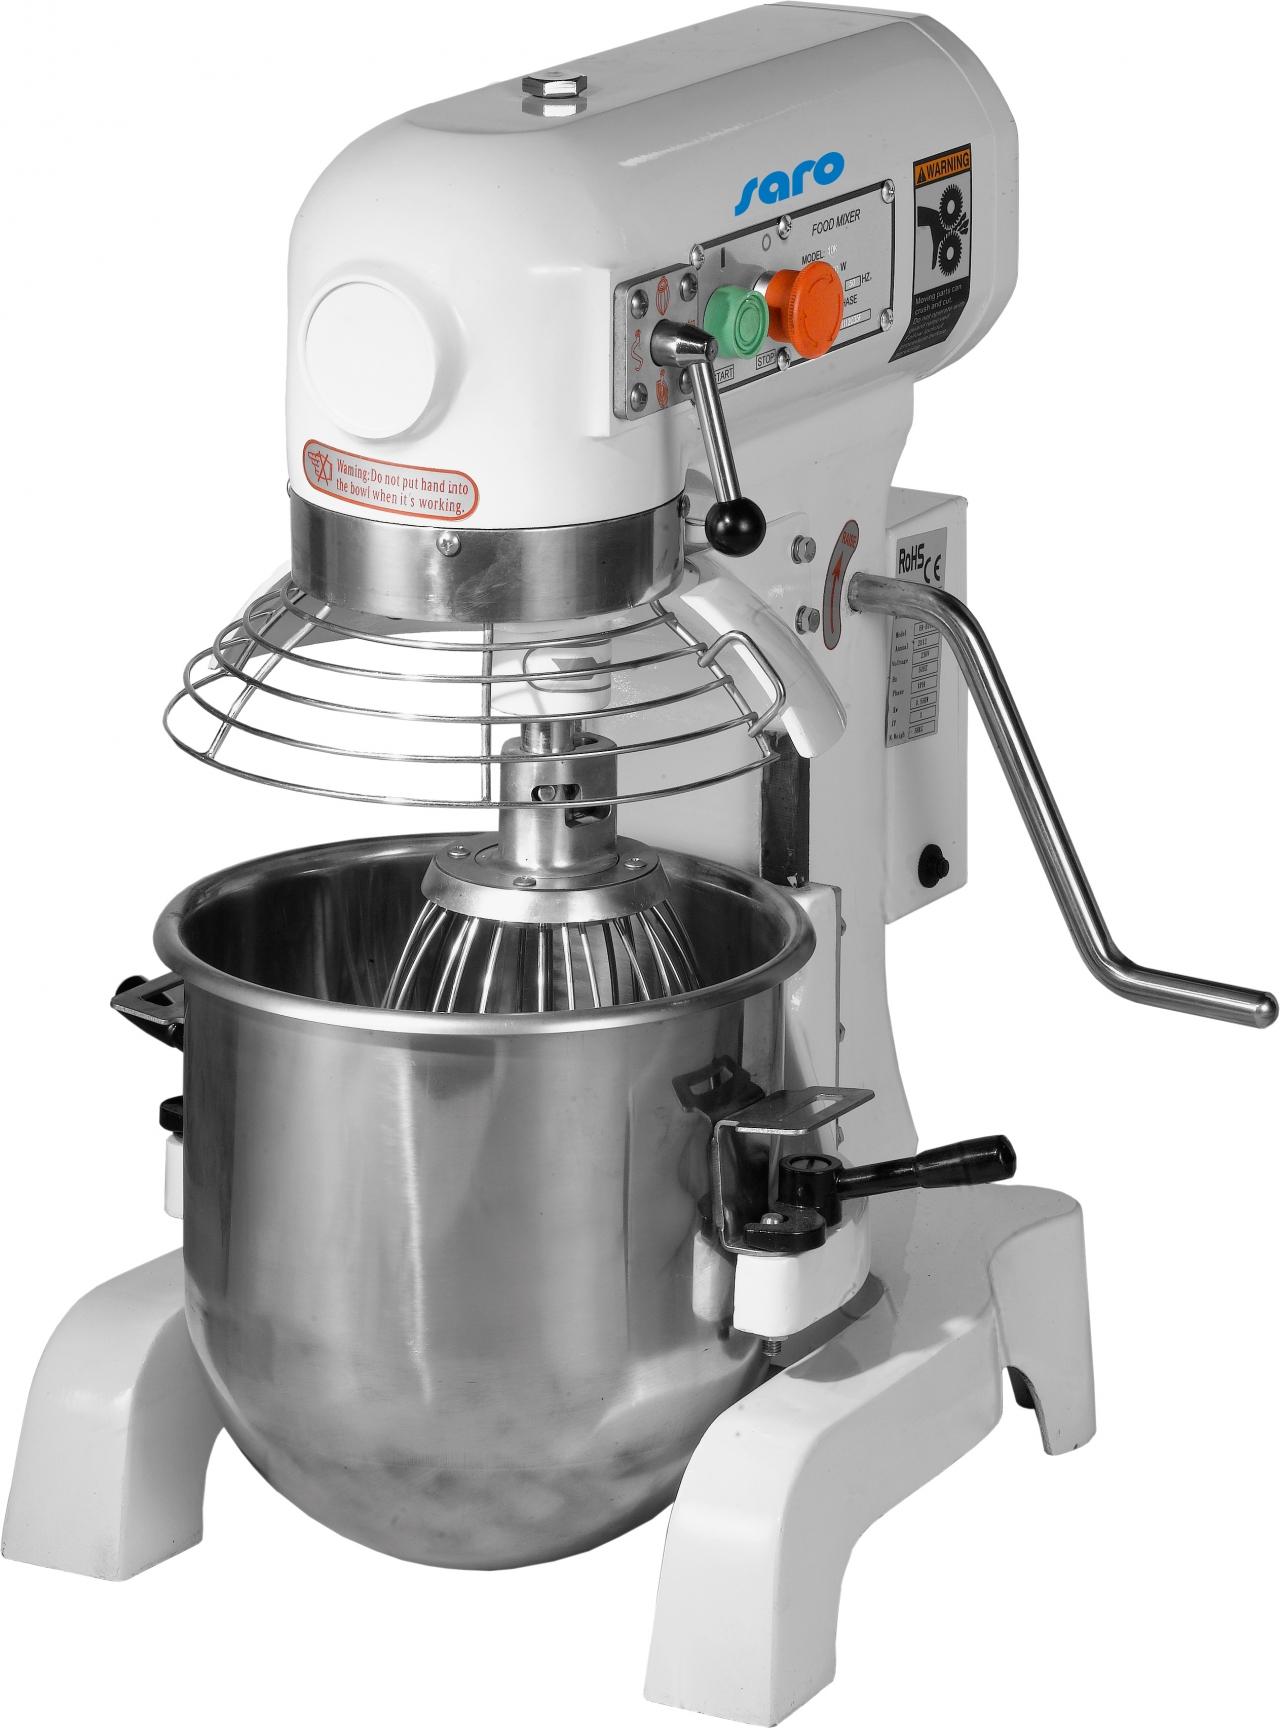 Planetary mixer PR10